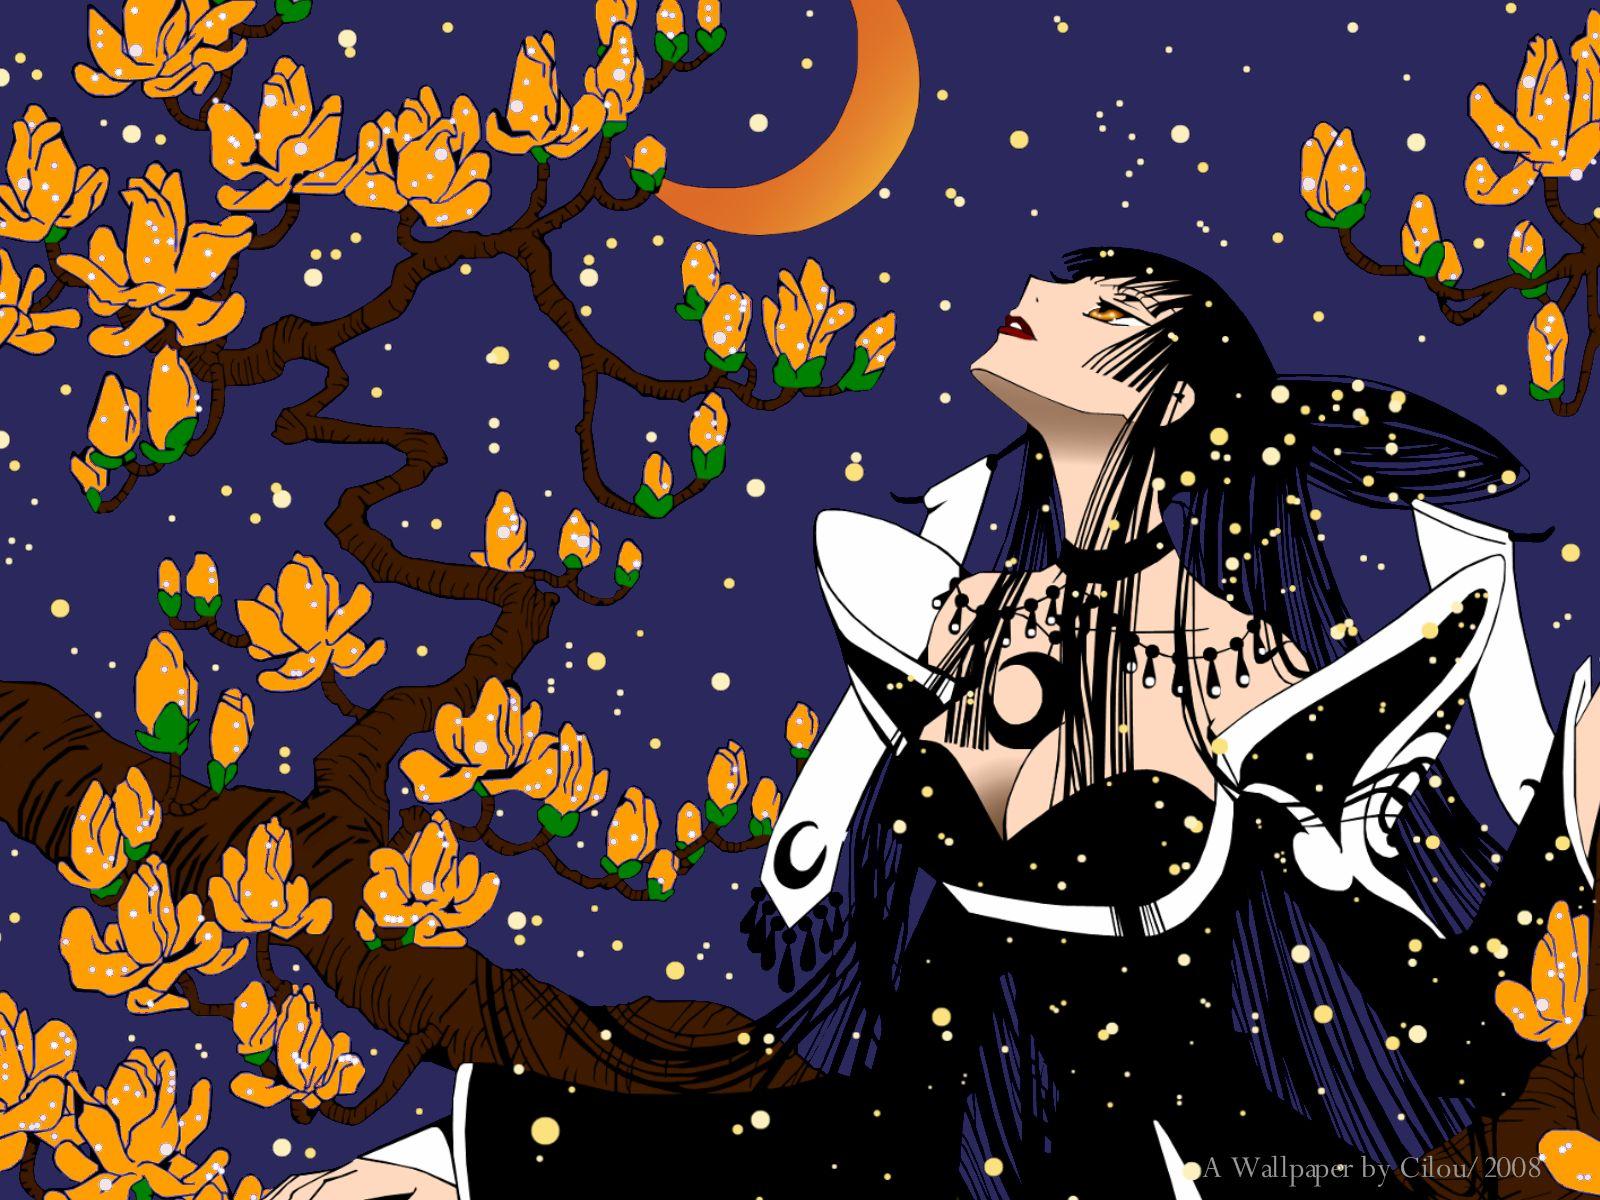 Xxxholic manga anime hd wallpaper 01 imagez only - Wallpapers hd anime ...